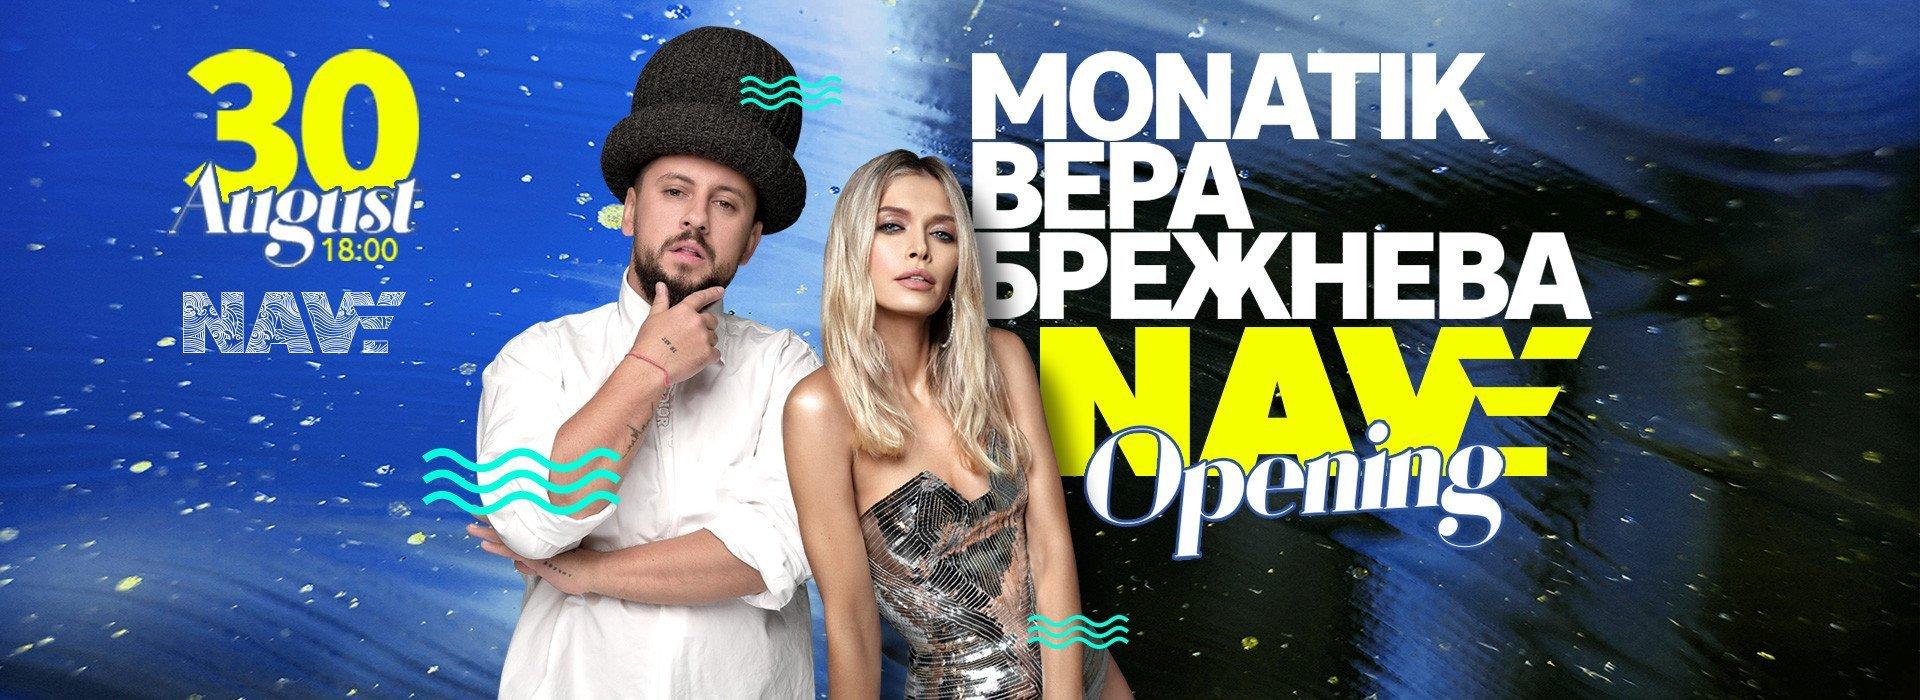 NAVY Opening: Monatik & Вера Брежнева